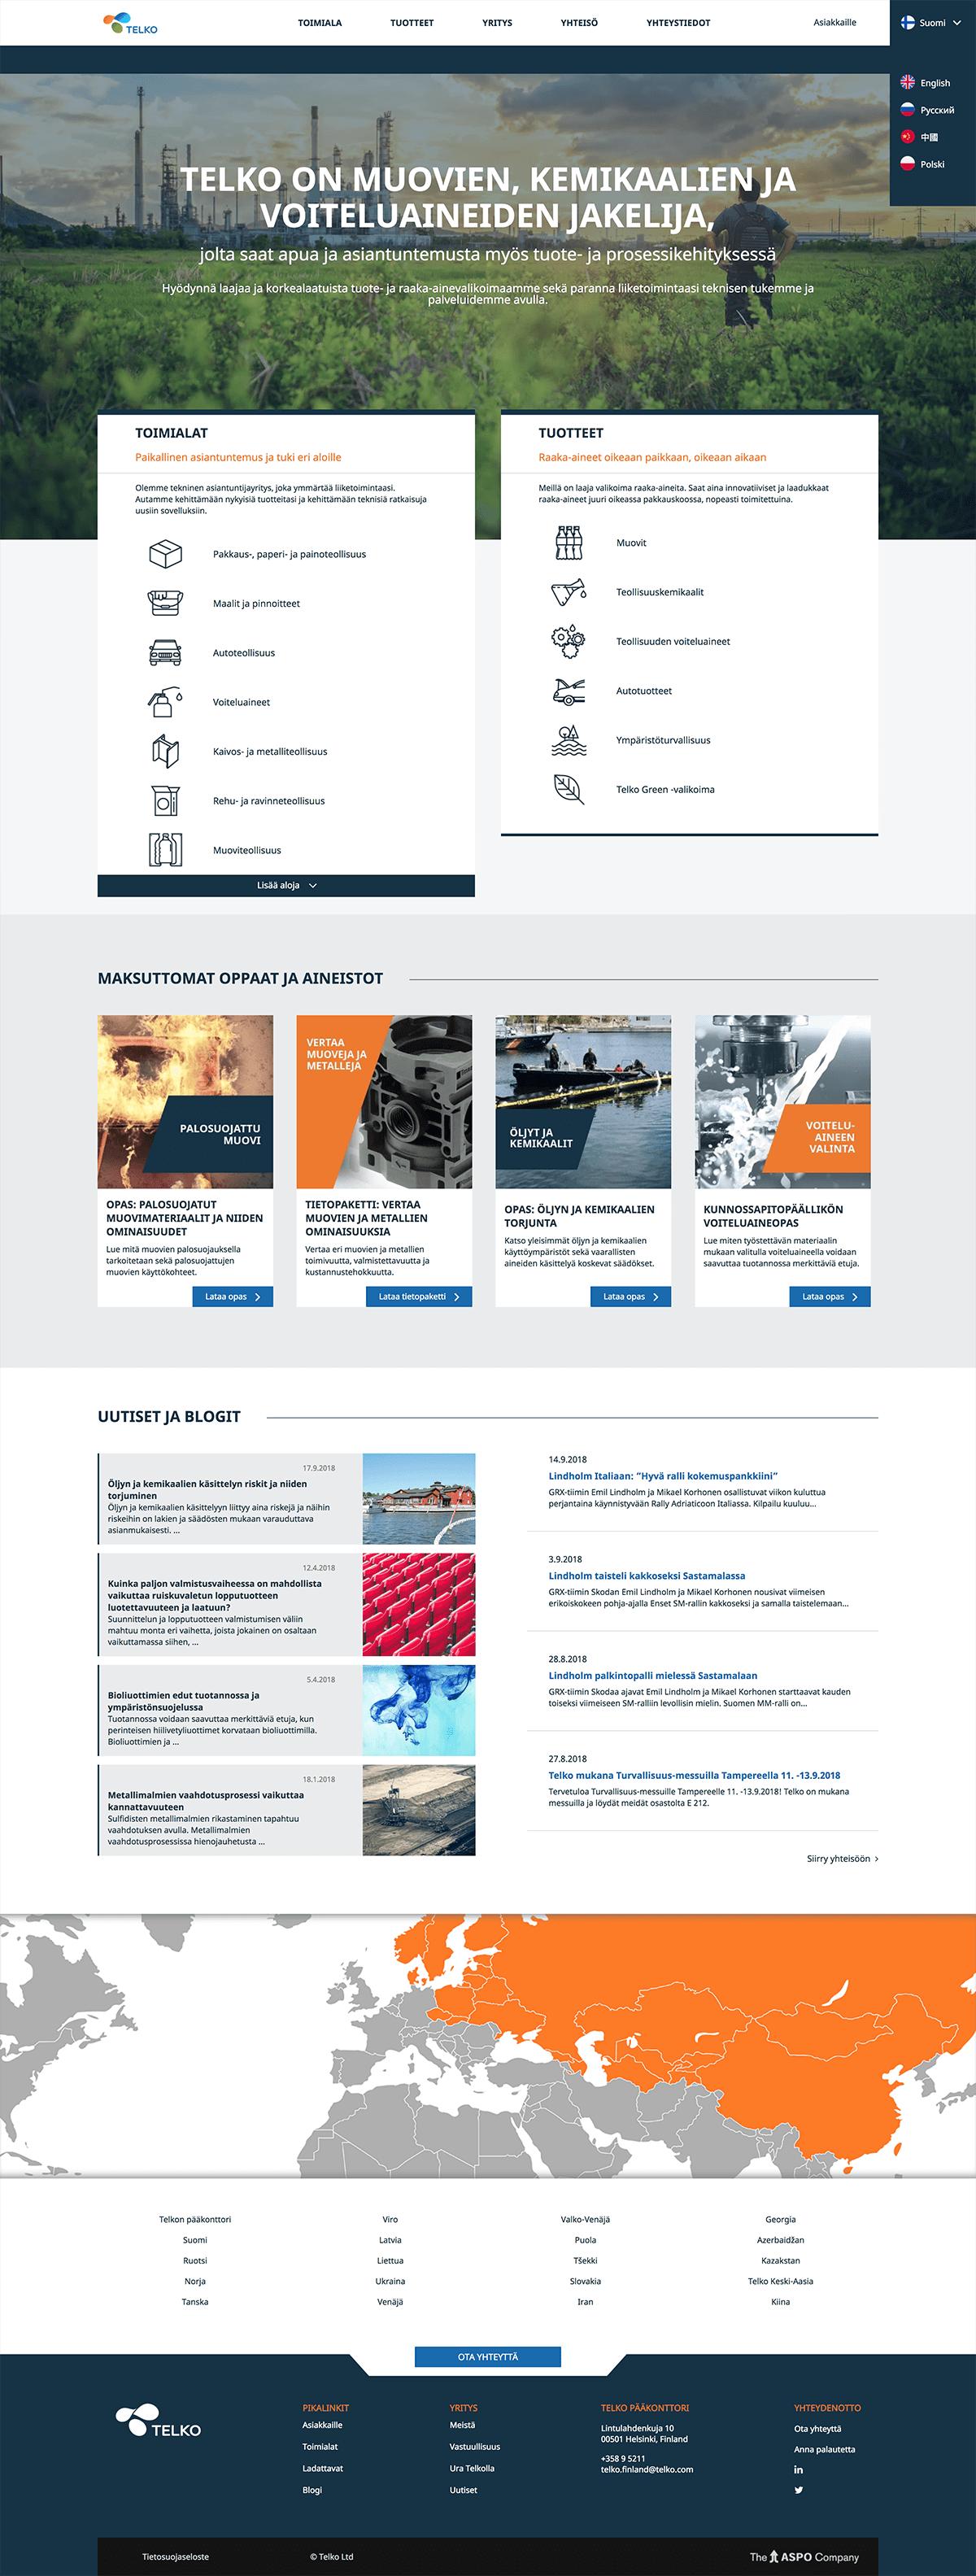 telko_new_website_sales_communications_